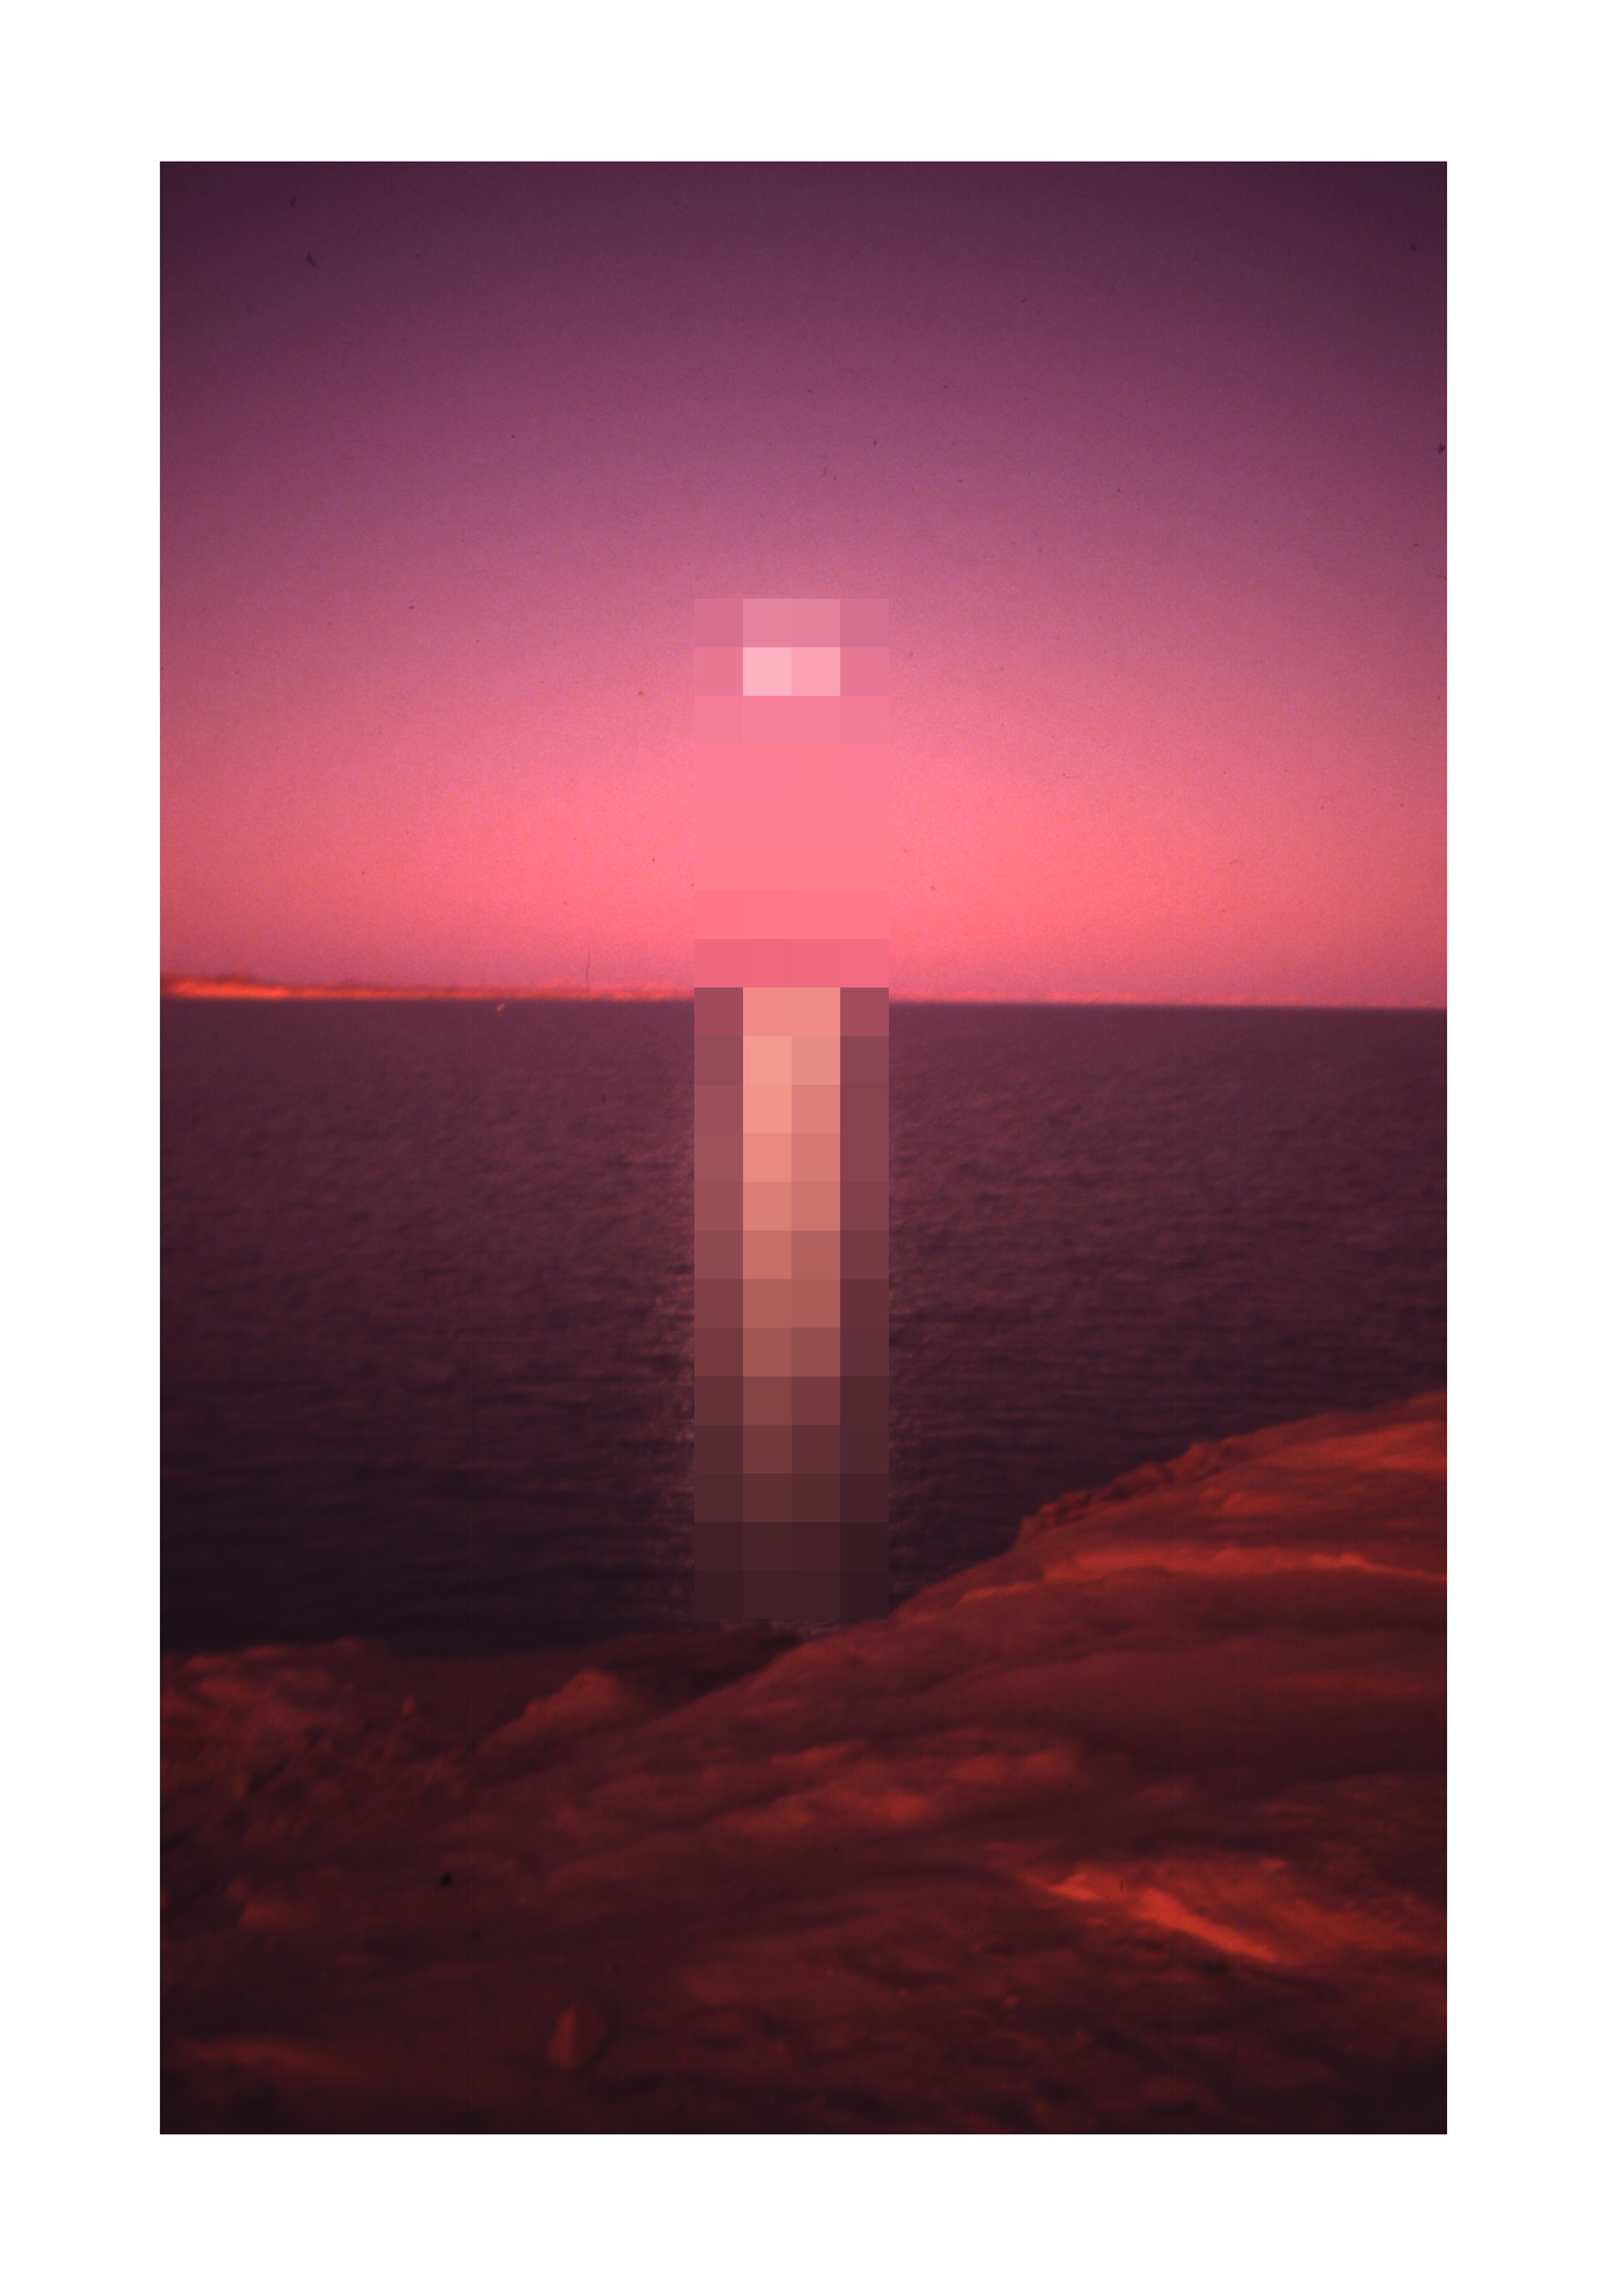 Untitled (p080), 2014